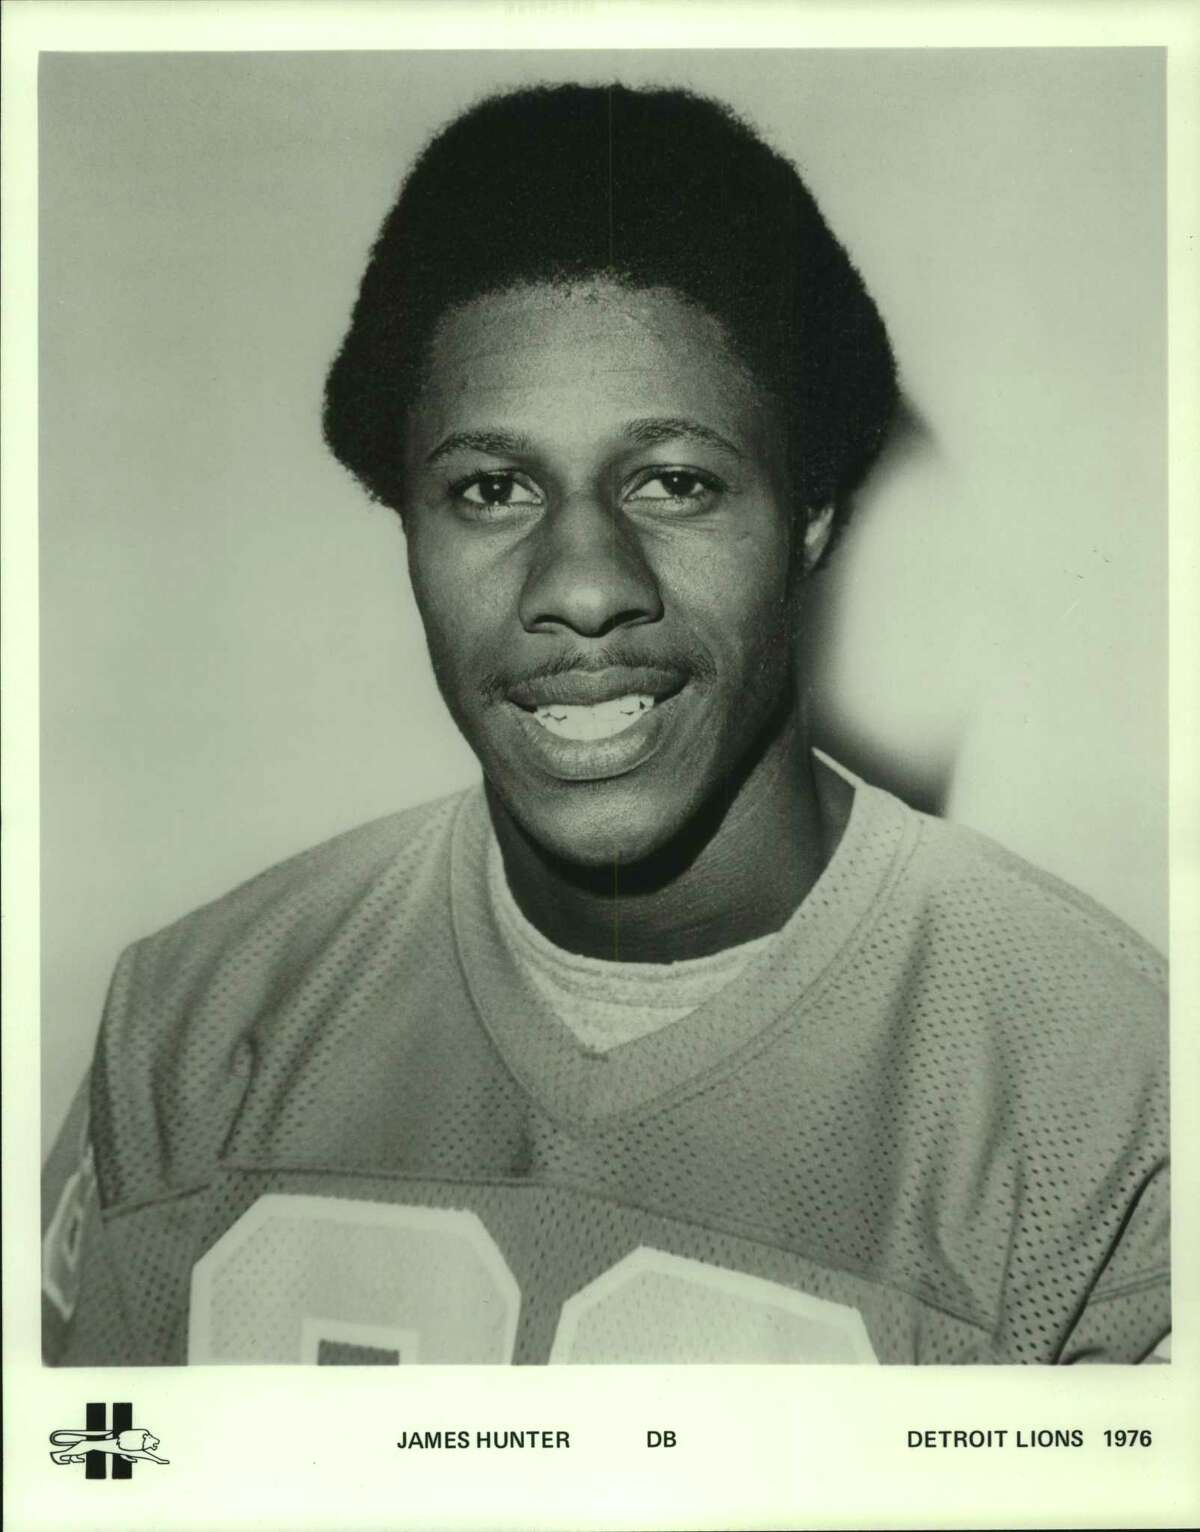 Detroit Lions' football defensive back James Hunter. 1976.